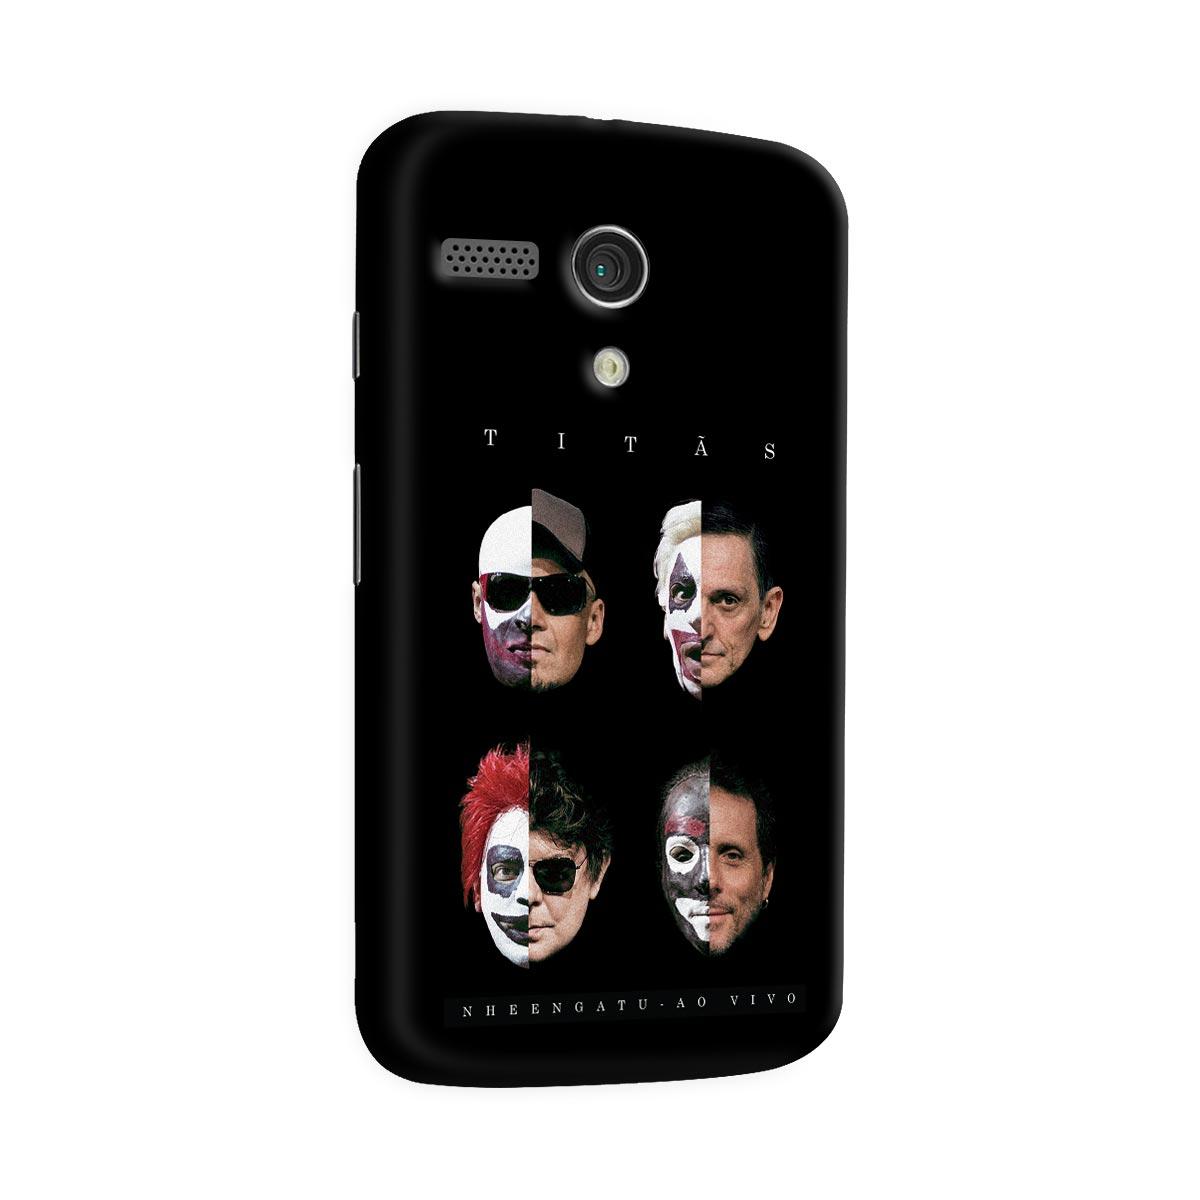 Capa para Motorola Moto G 1 Titãs Capa Nheengatu Ao Vivo